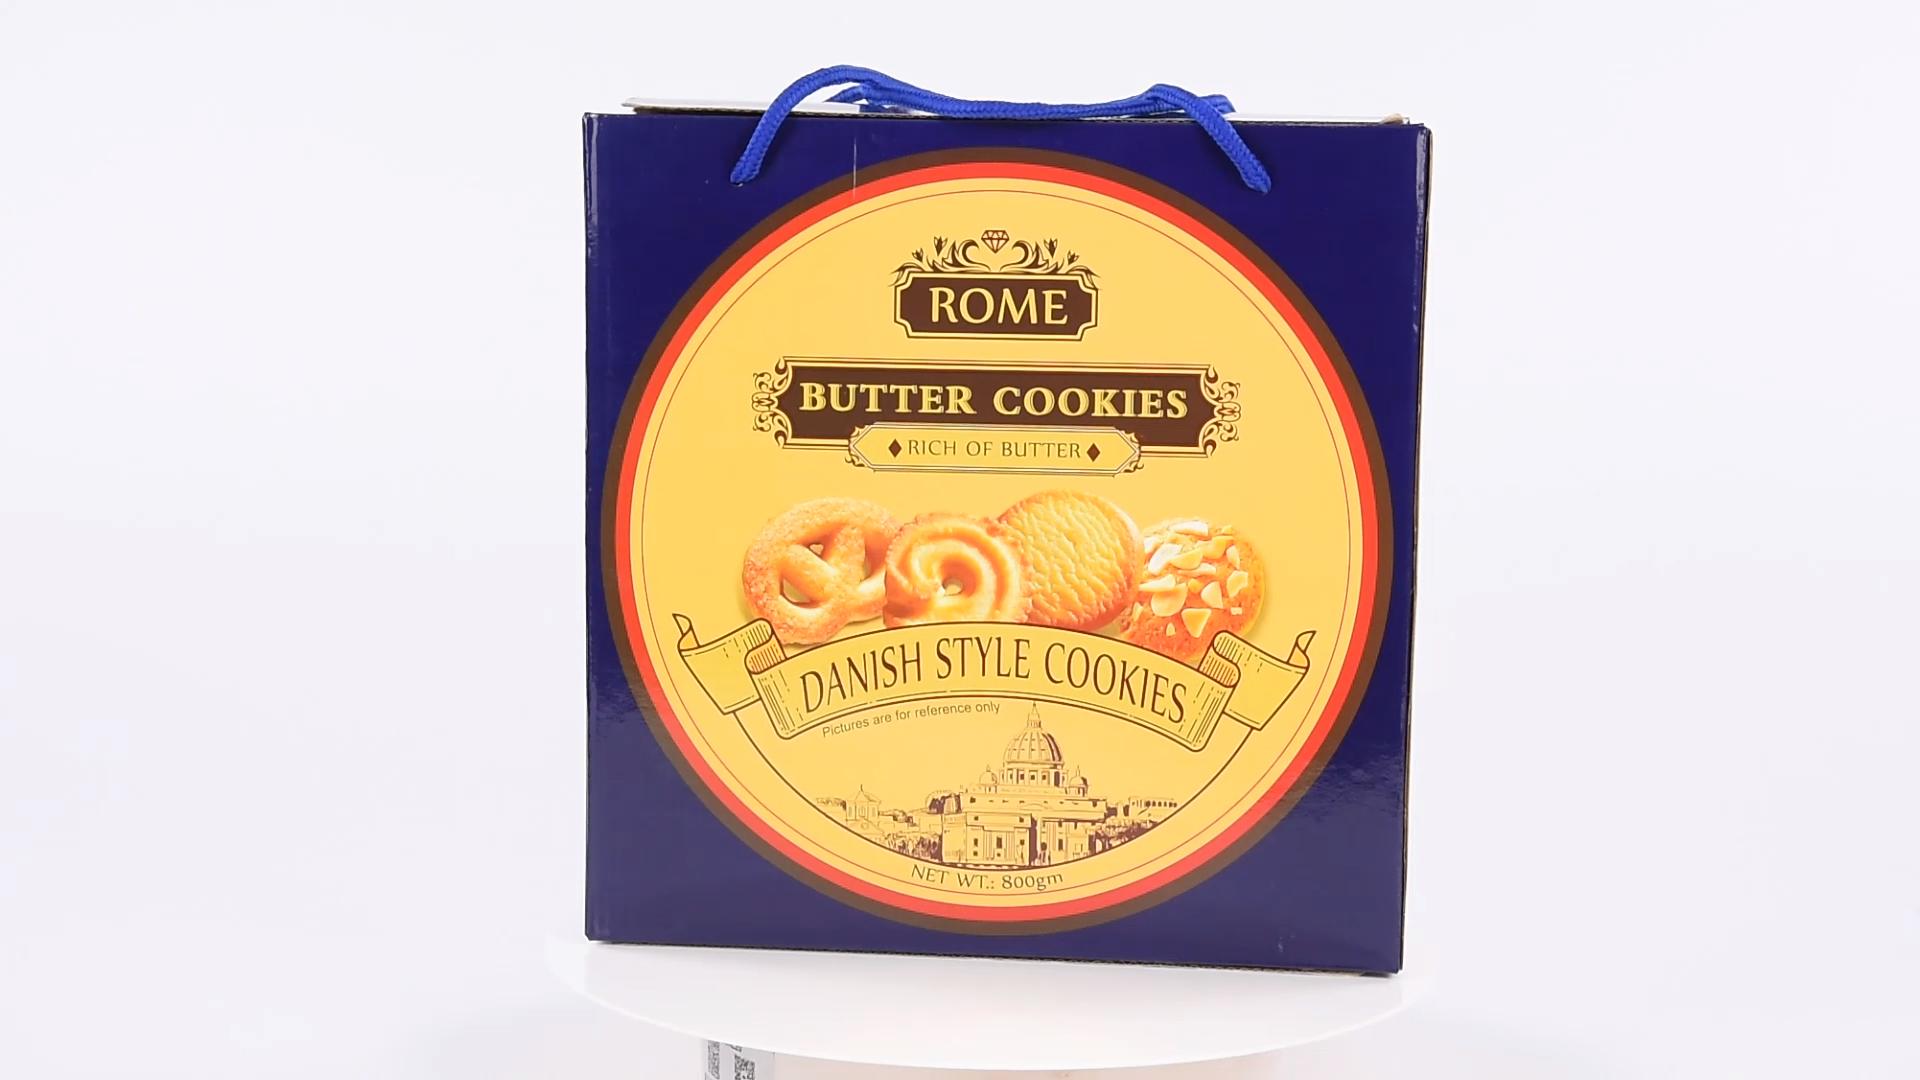 Turc Malaisie biscuits au chocolat biscuits halal 908g royal Danisa beurre boîte à biscuits